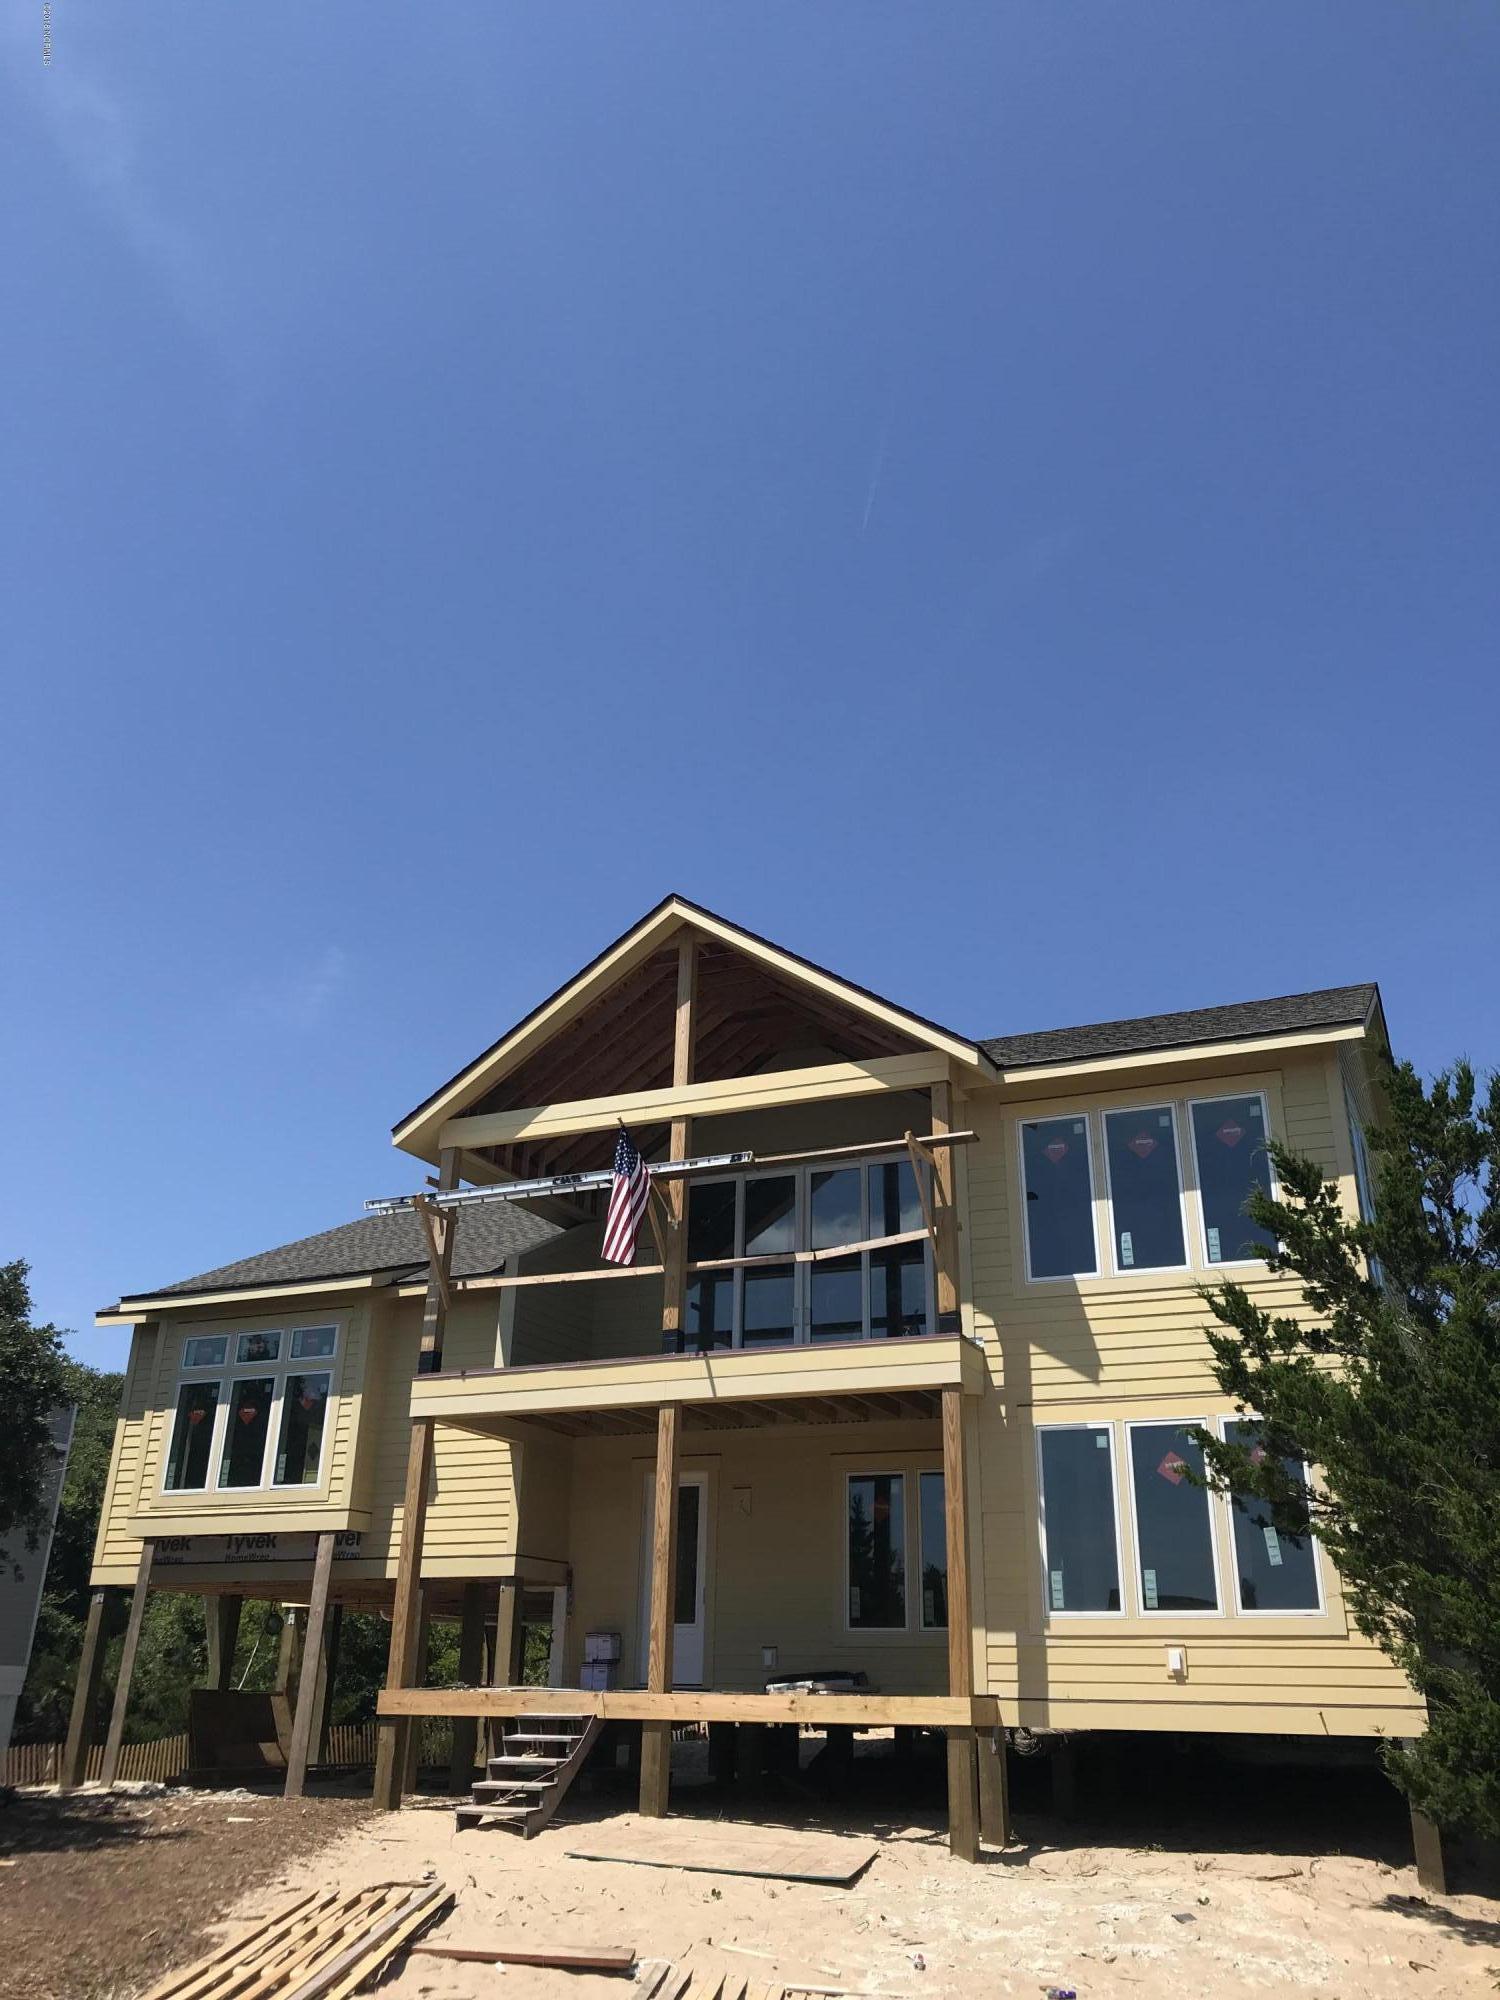 Carolina Plantations Real Estate - MLS Number: 100117920